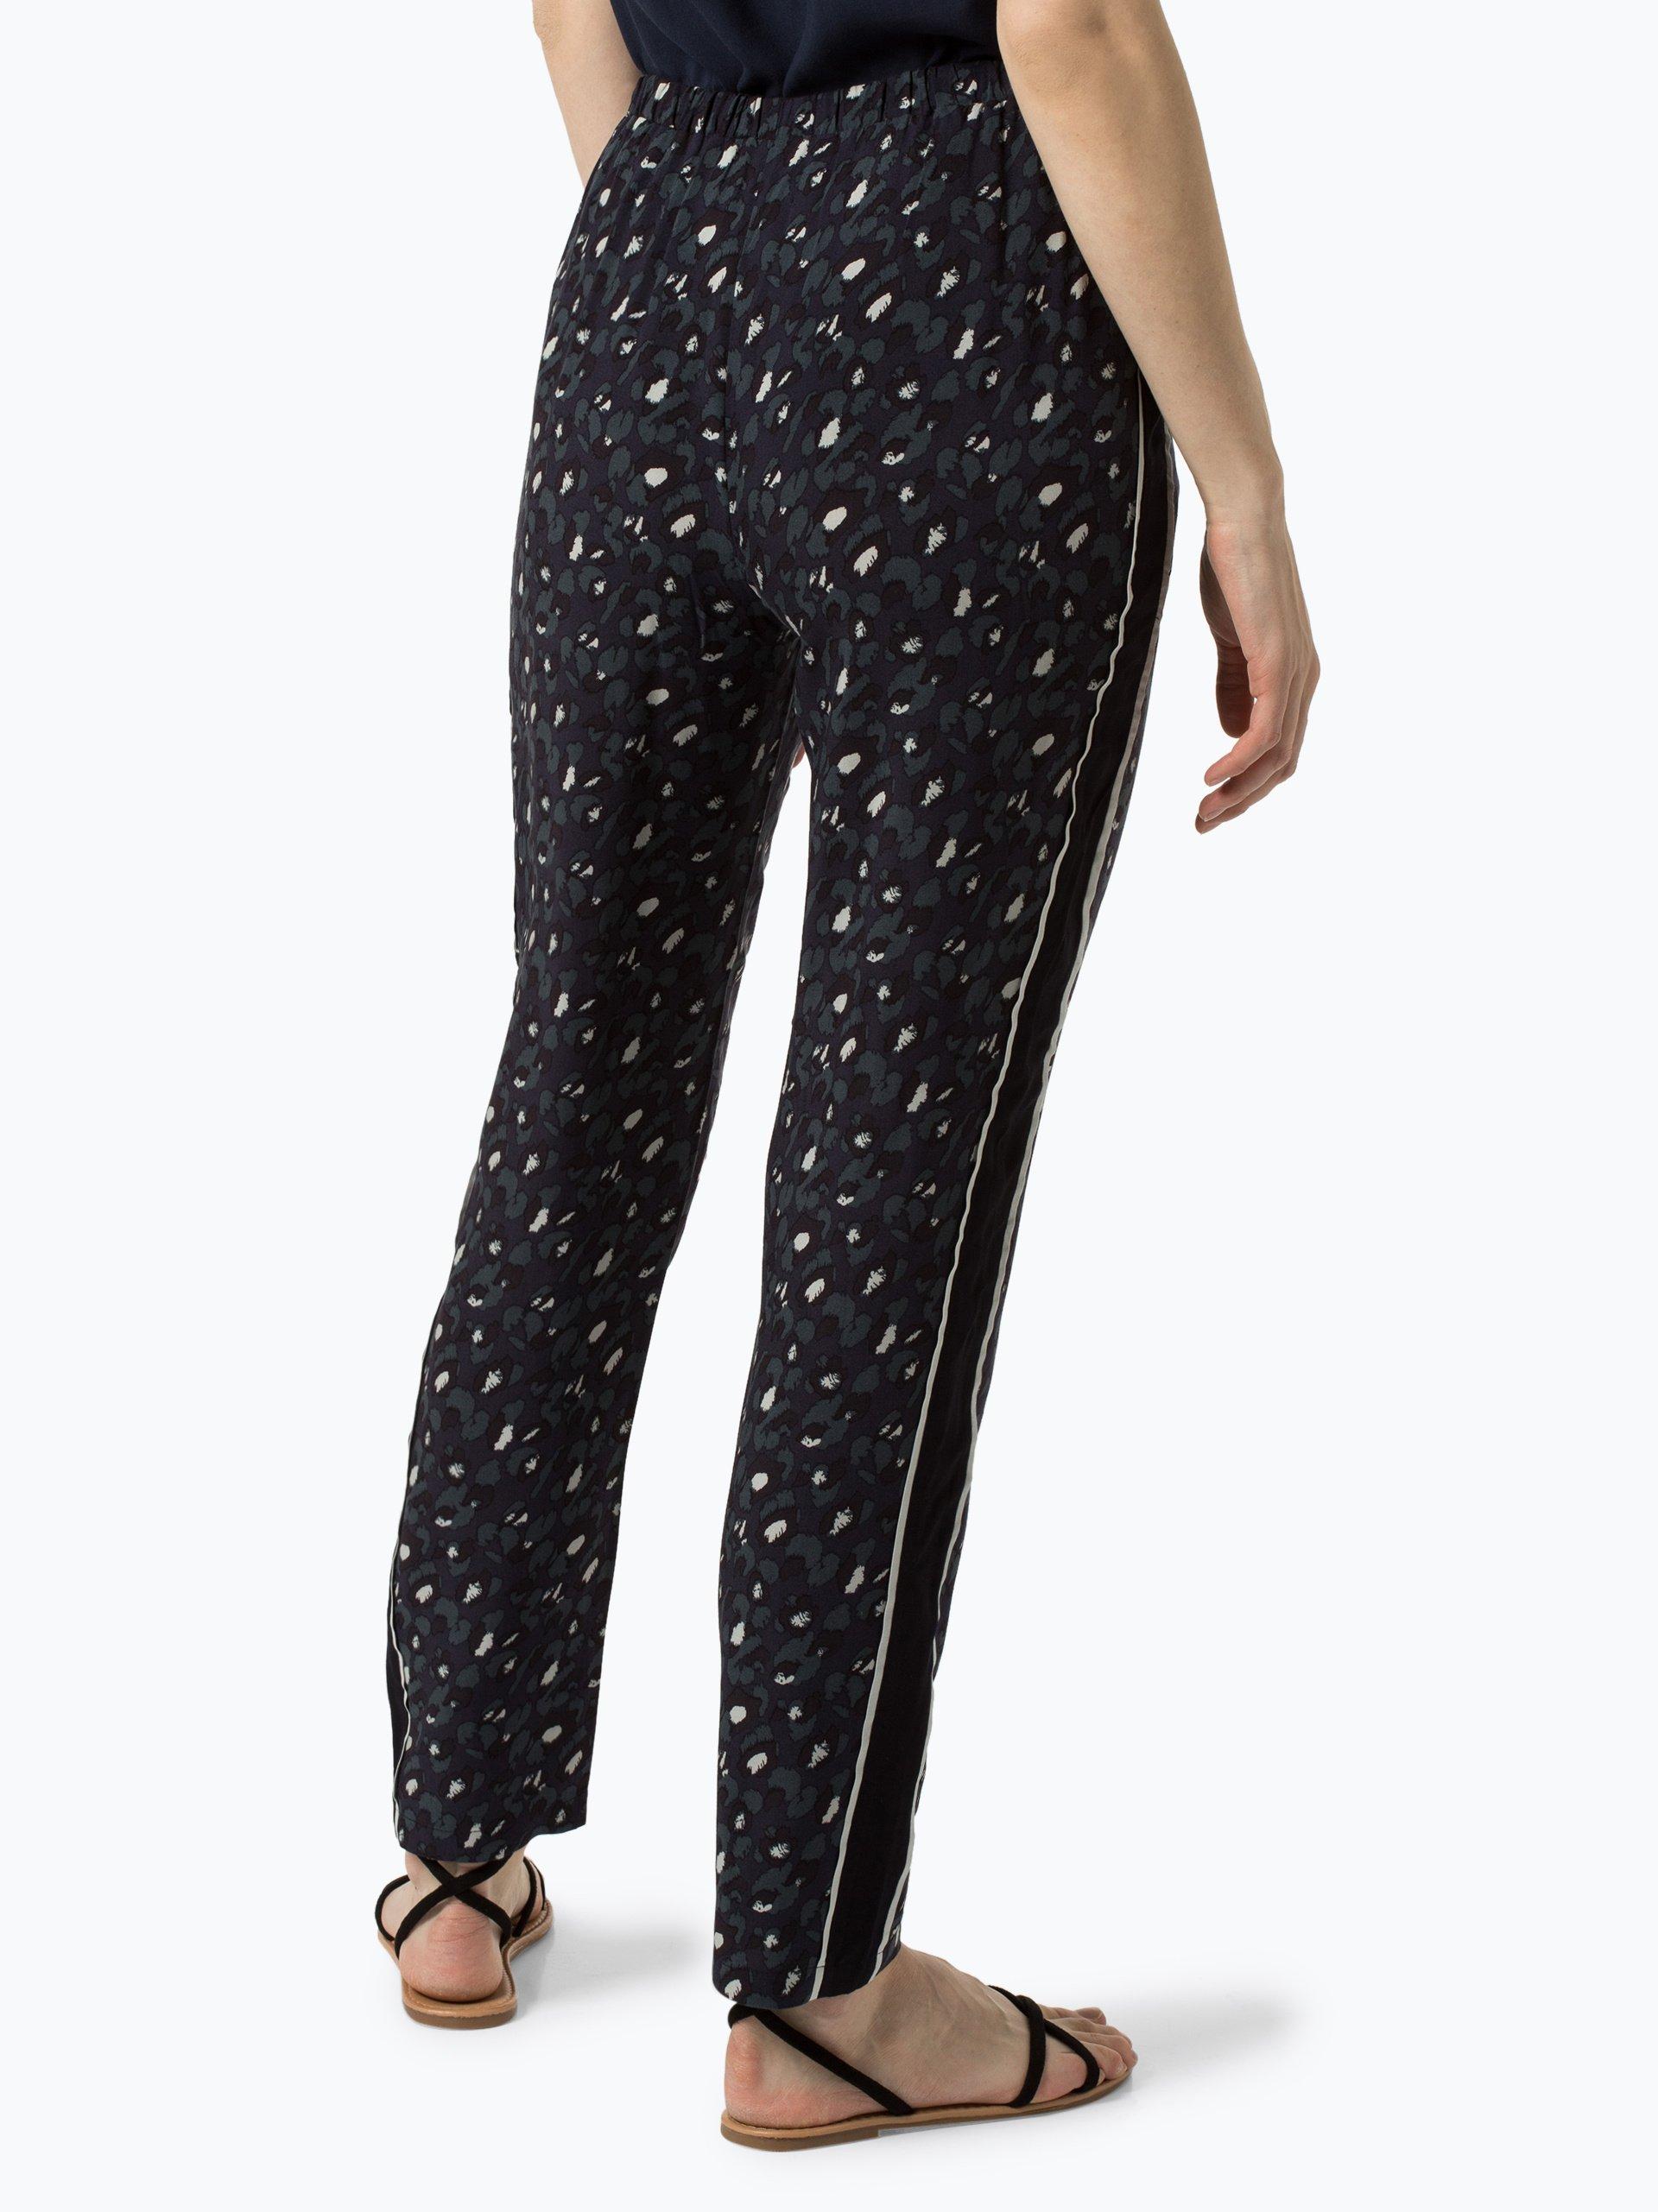 Opus Spodnie damskie – Maleo